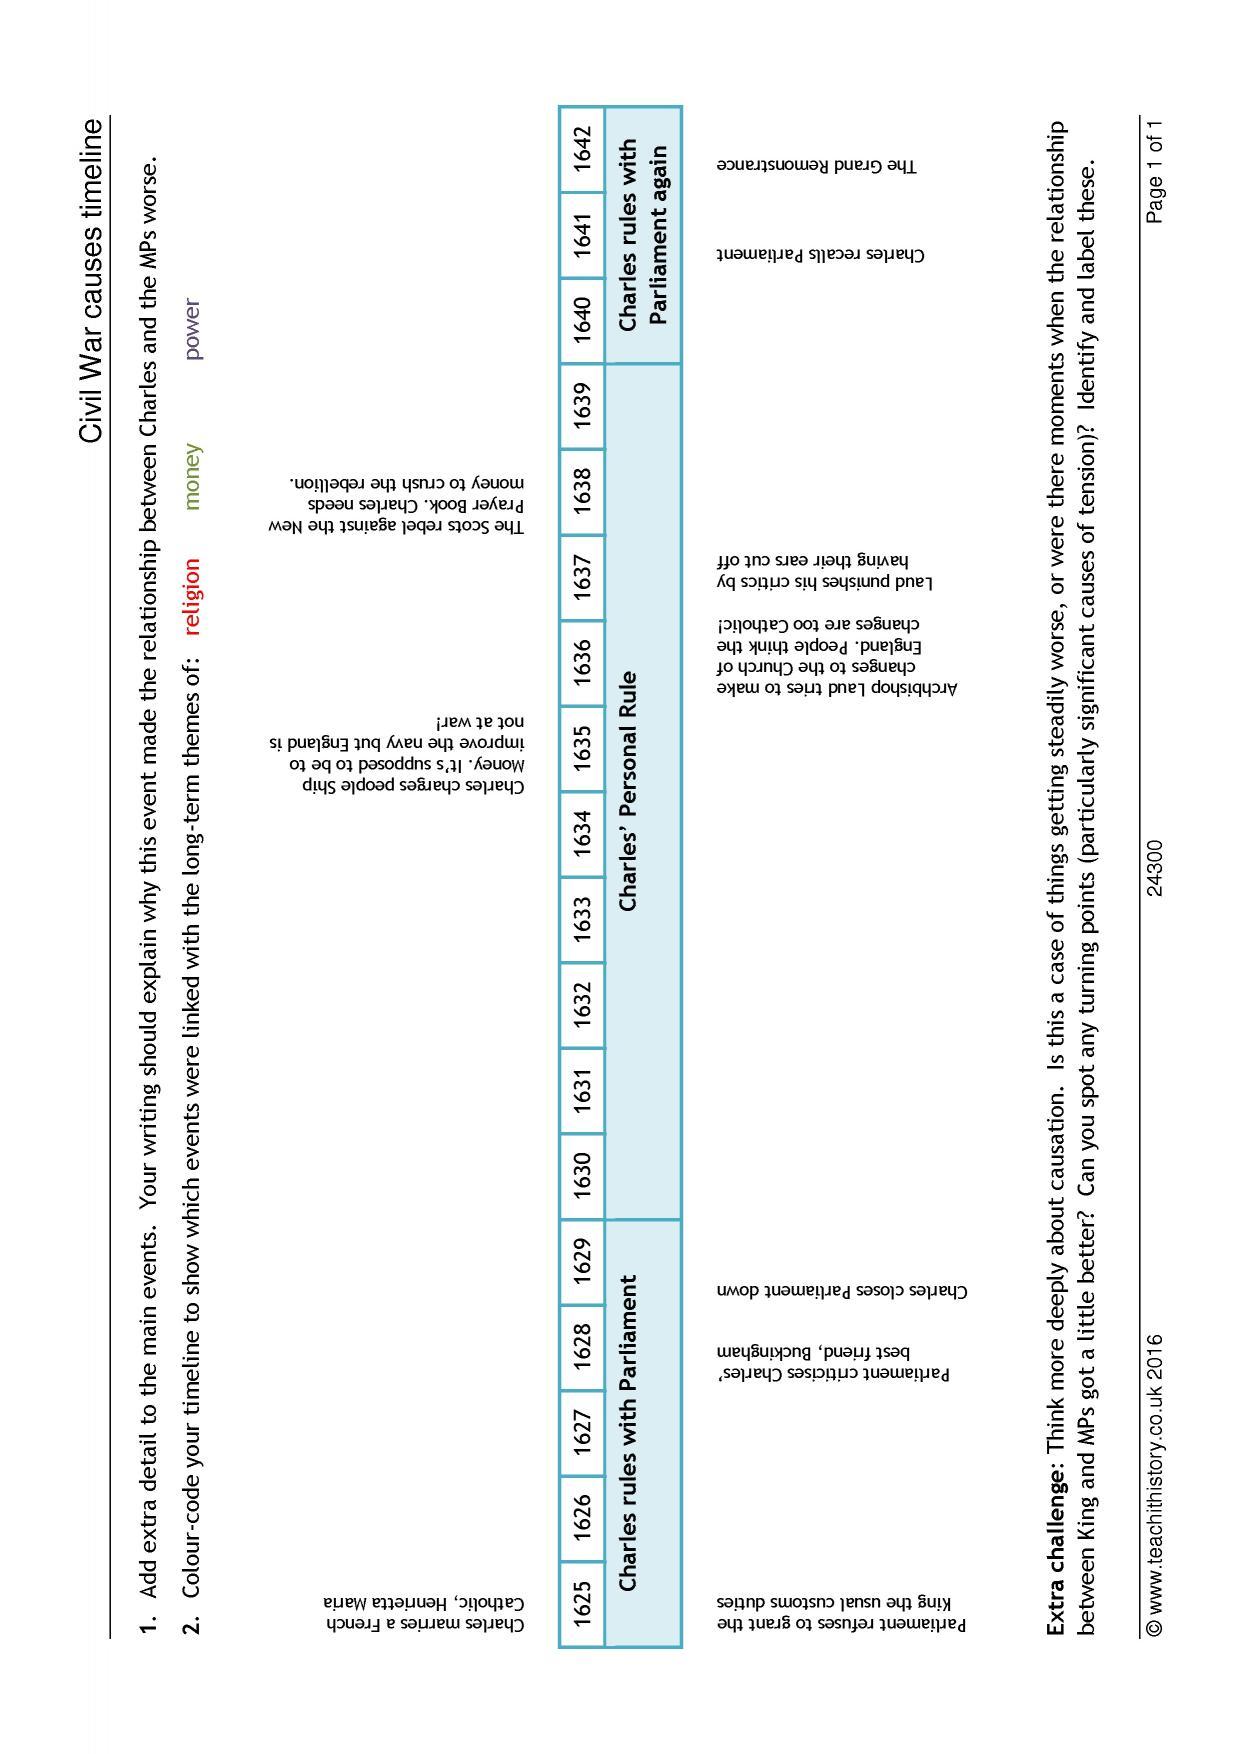 Worksheet Civil War Timeline Worksheet Grass Fedjp